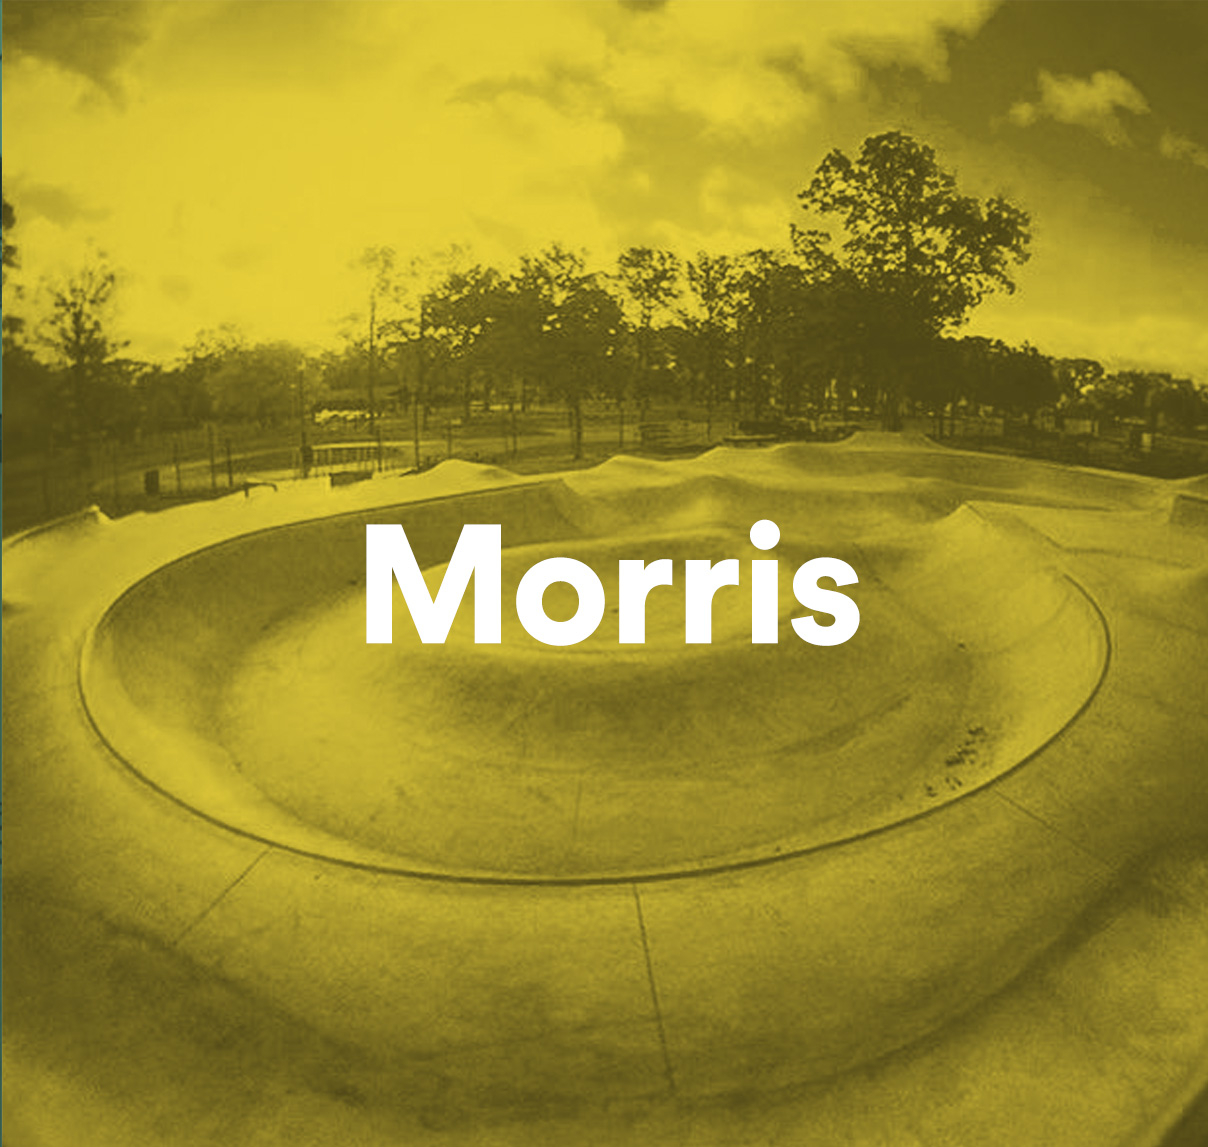 projects_thumbs_morris.jpg